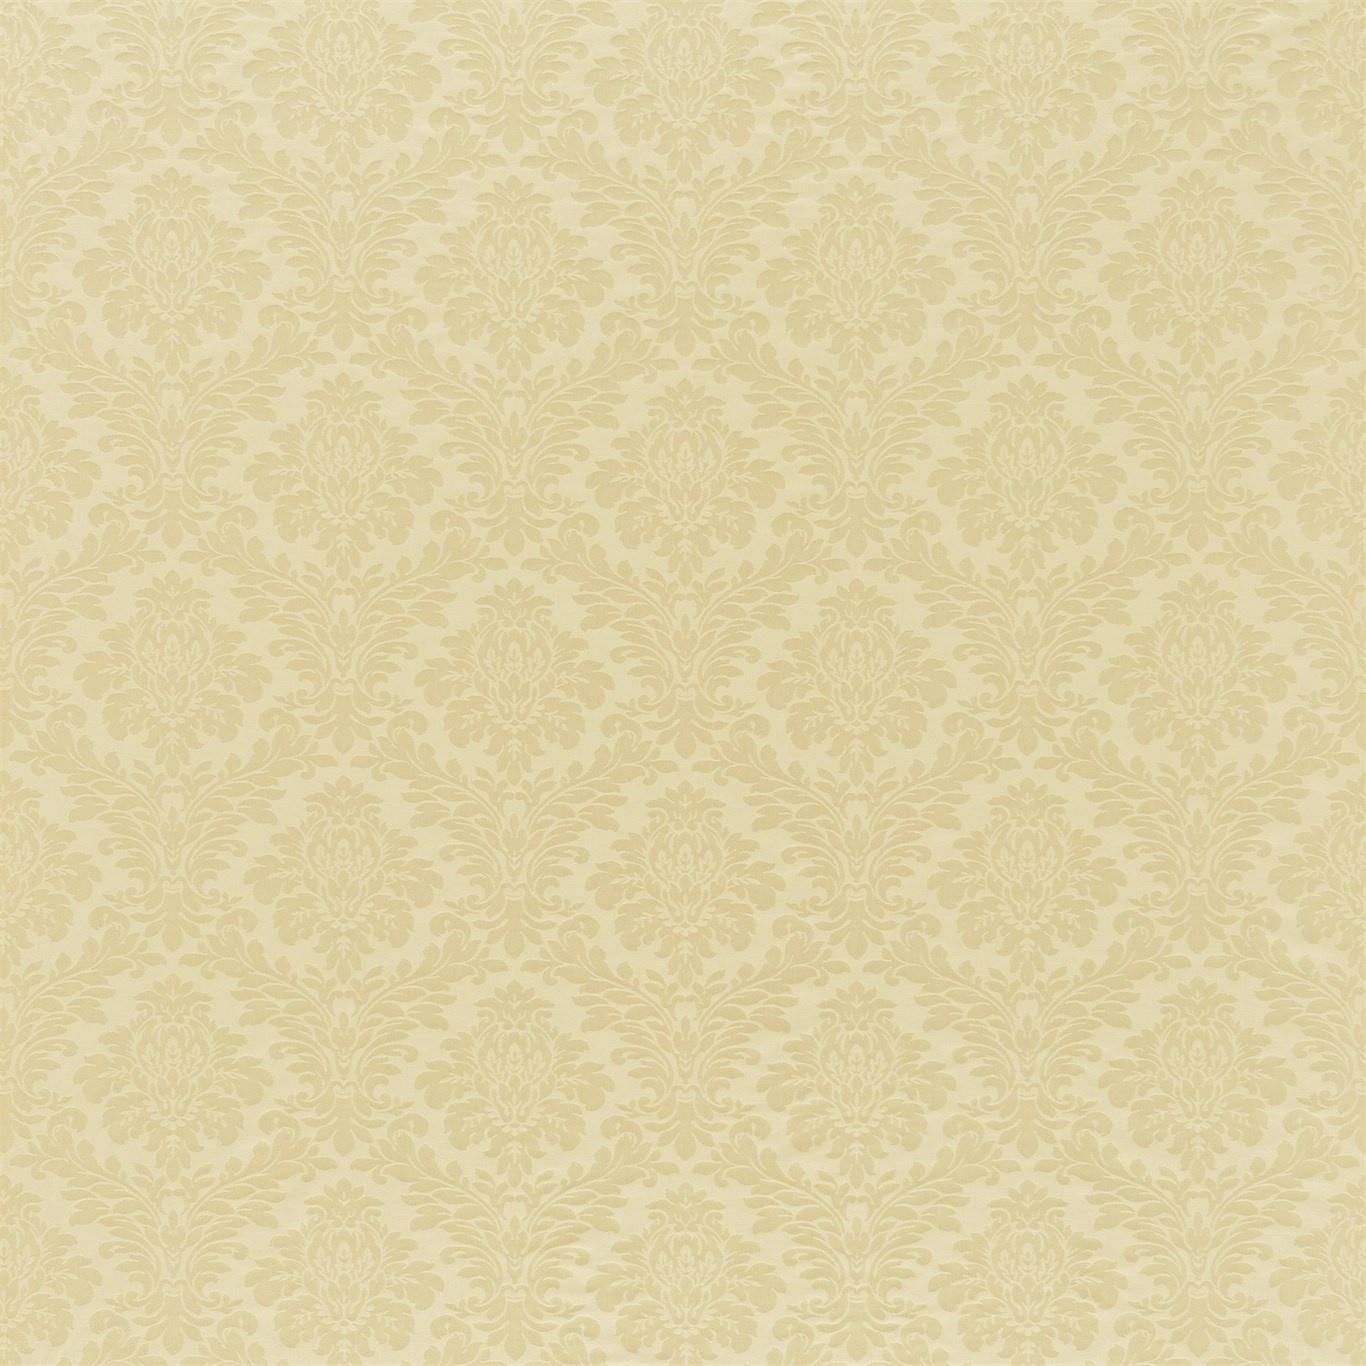 Image of Sanderson Lymington Damask Nutmeg Fabric 232596